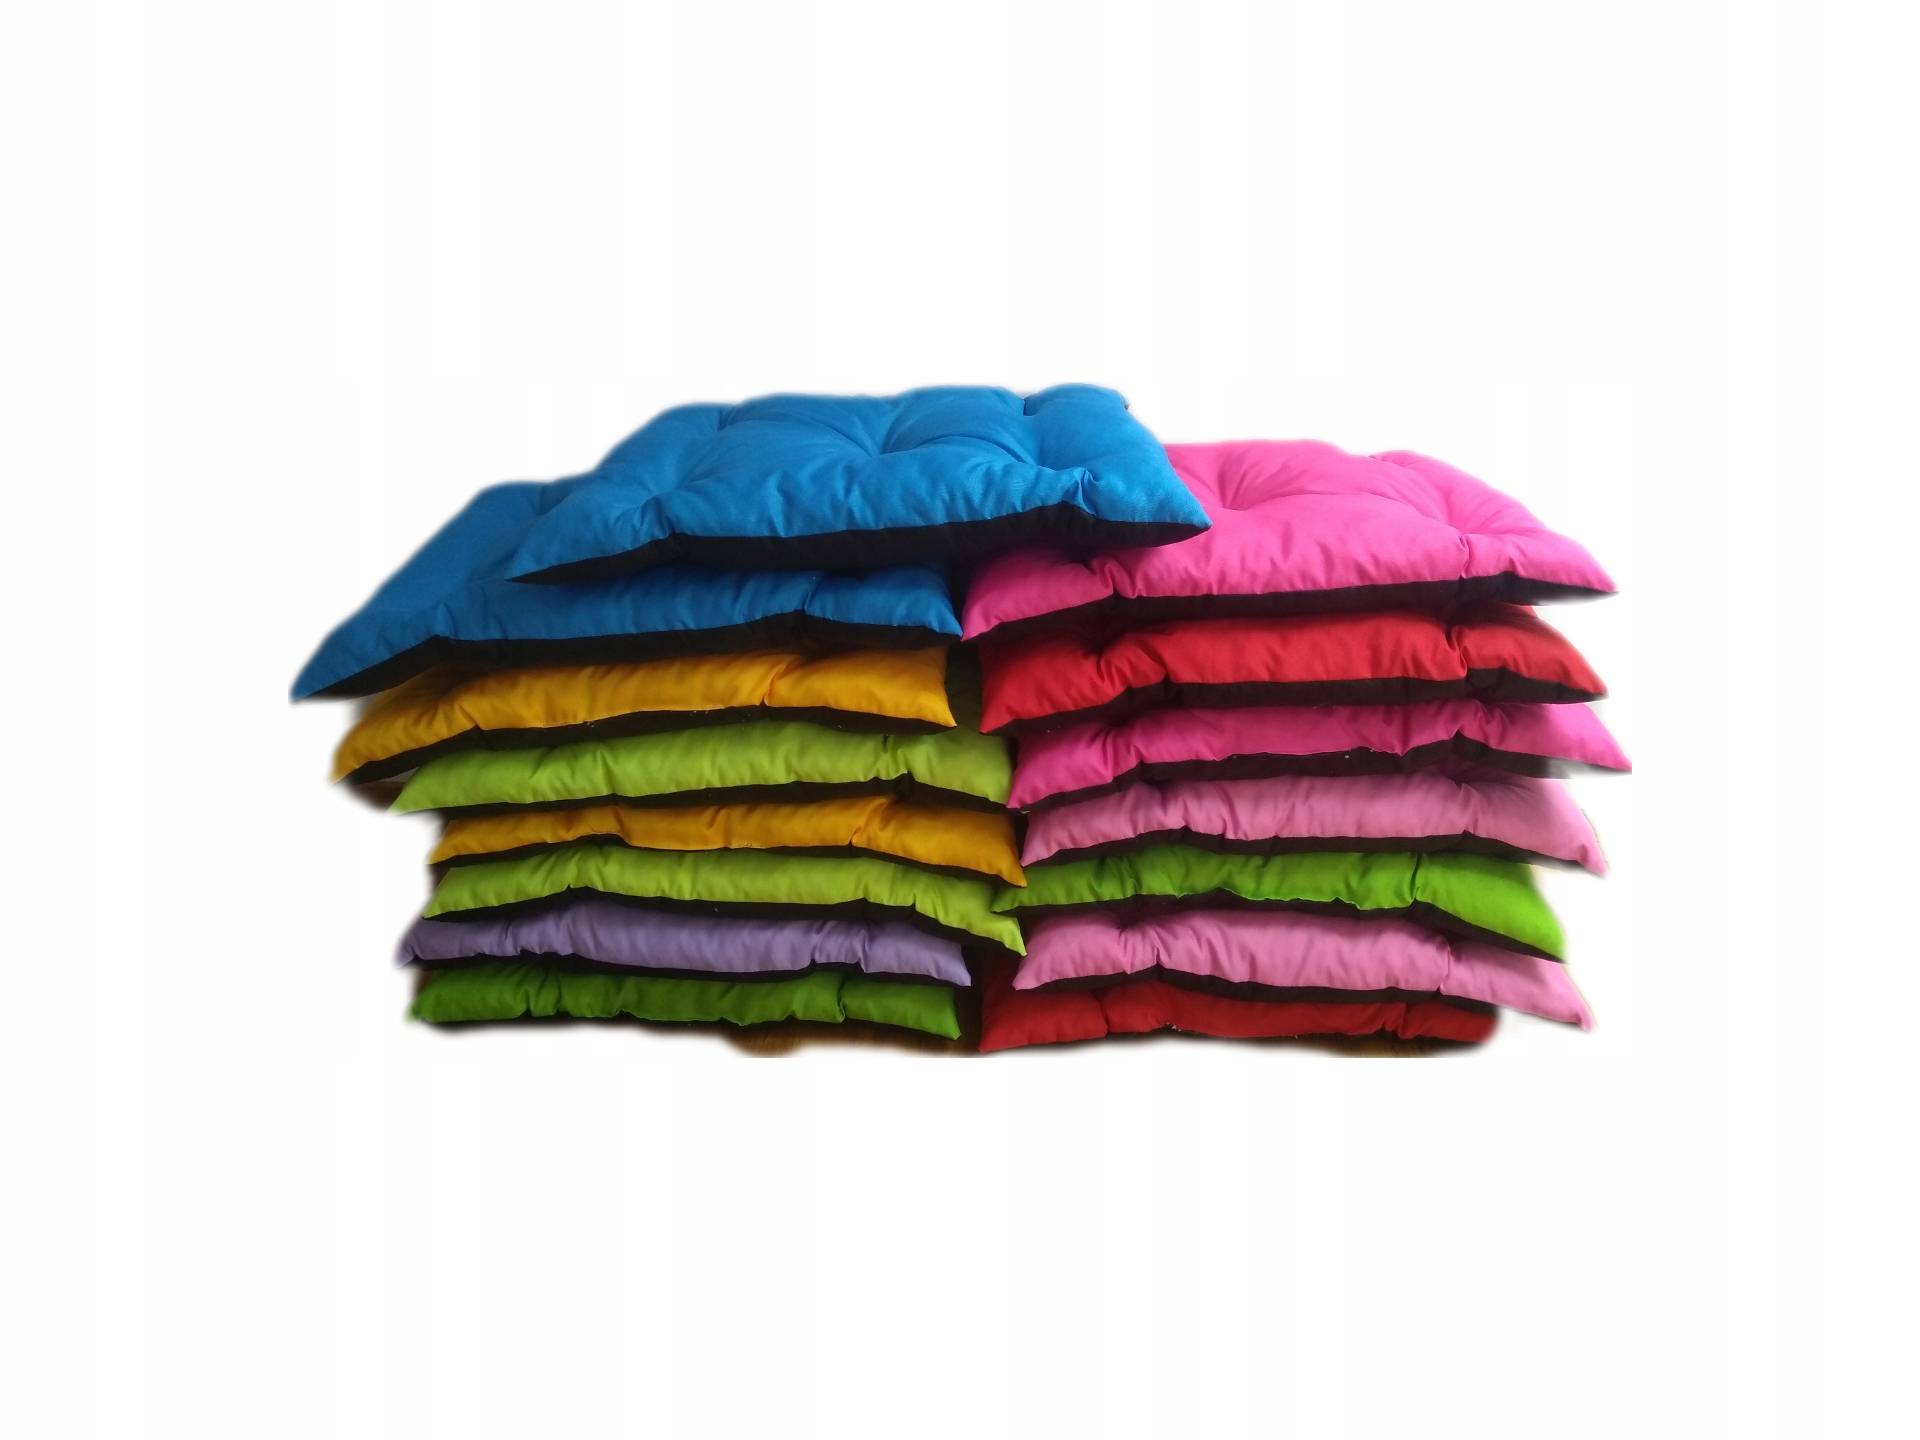 Подушка для собаки / кошки 50х70 + ИМЯ БЕСПЛАТНО